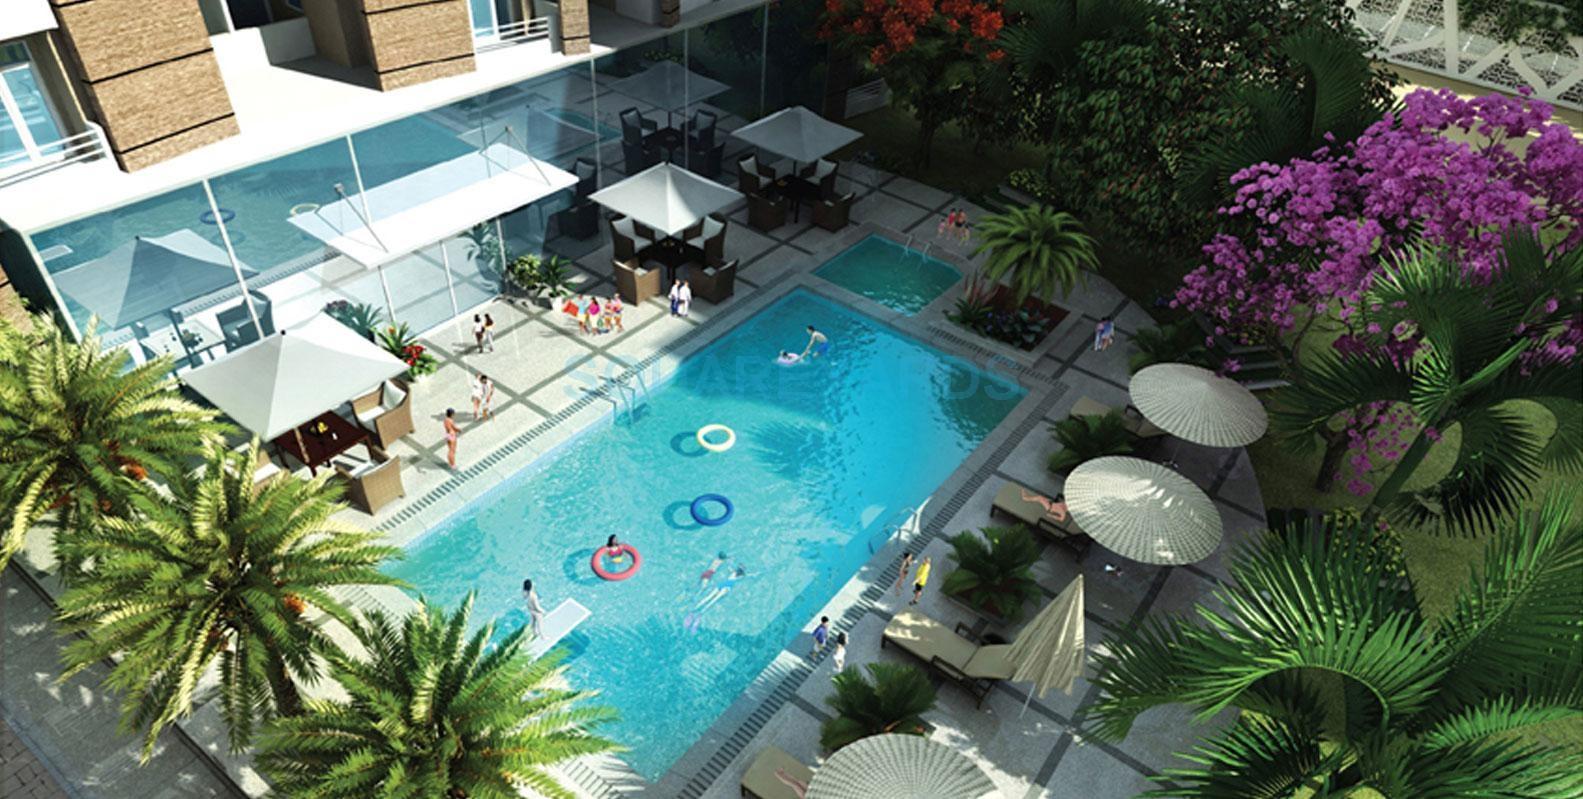 skyline grand prix amenities features4